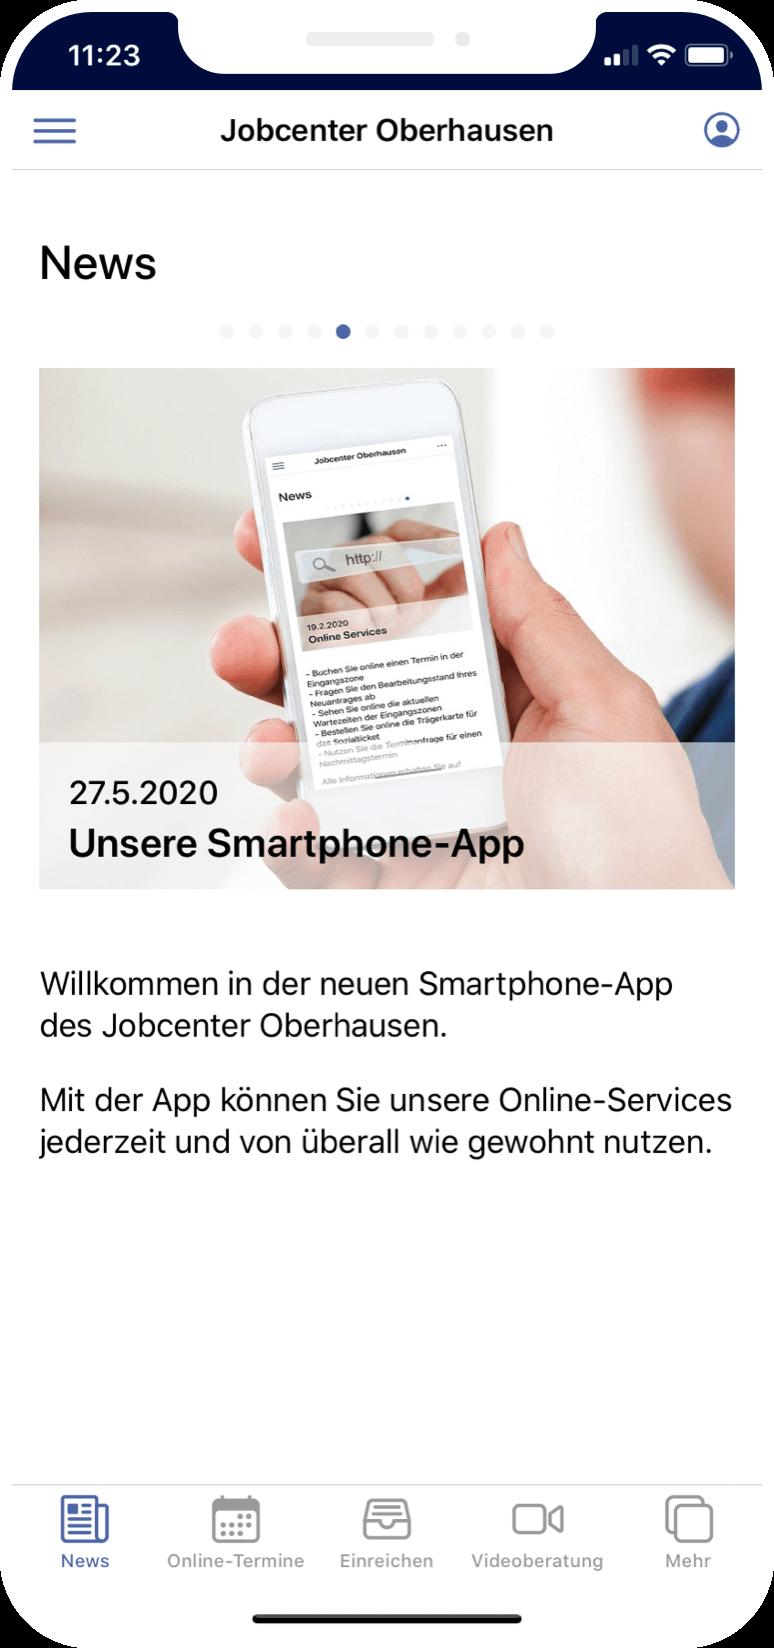 Jobcenter Oberhausen App